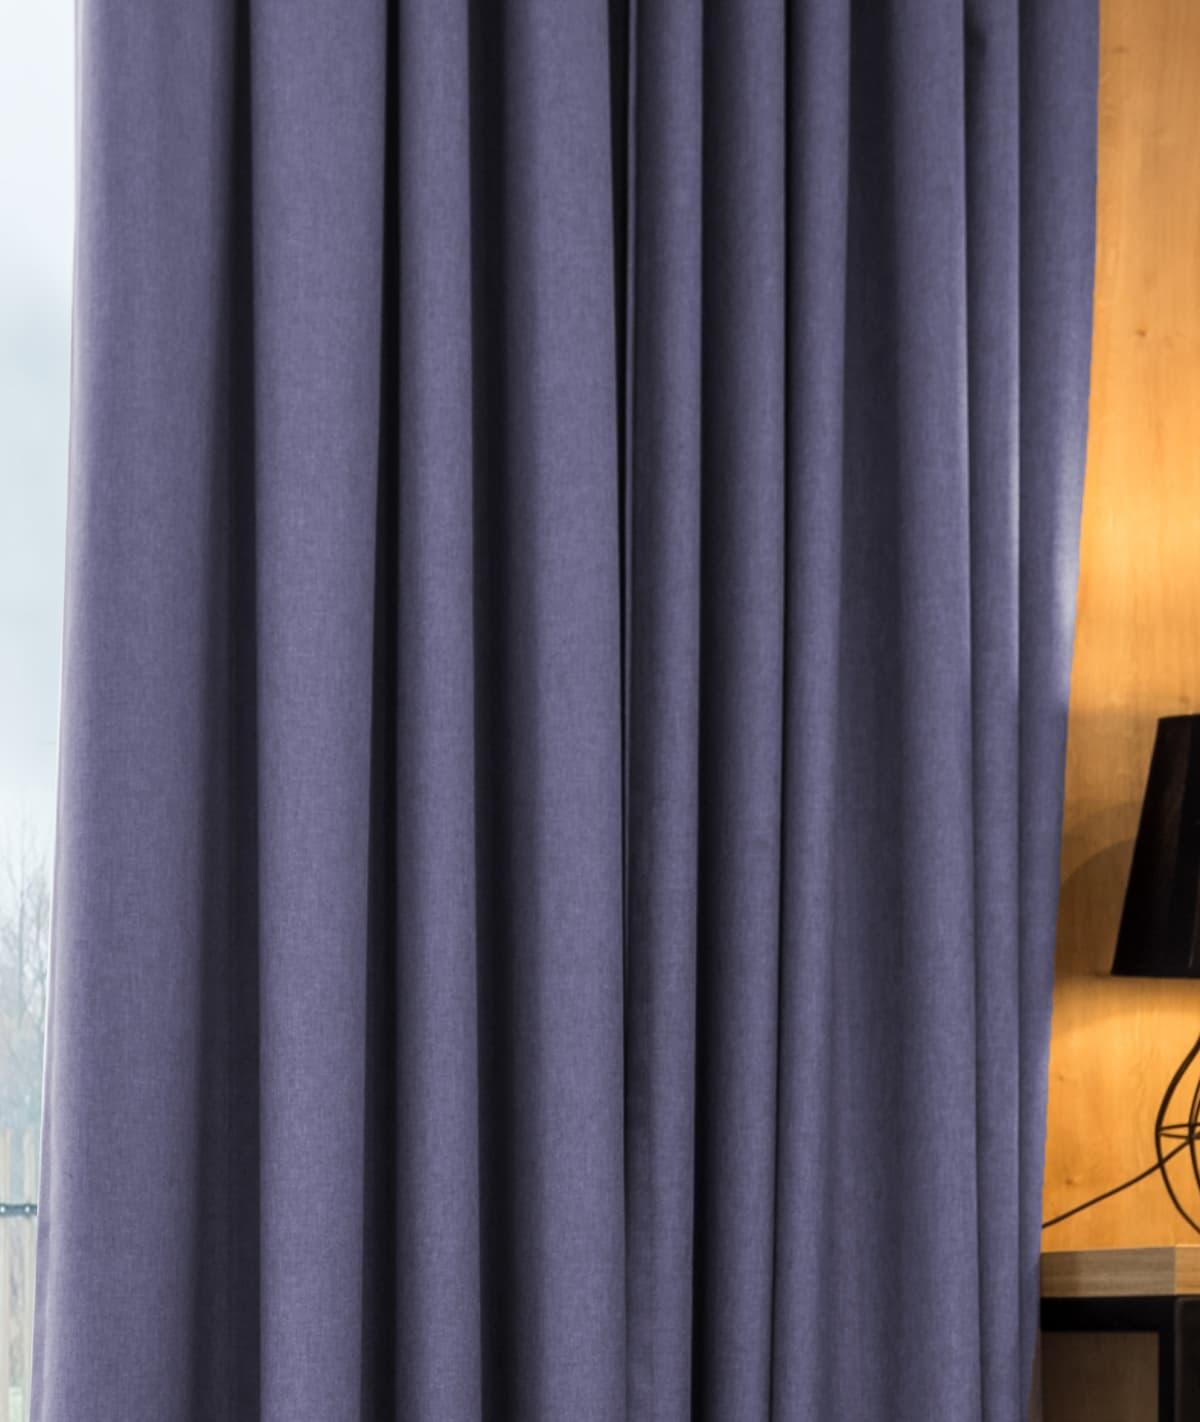 Stitched Midnight Purple Cotton Weave Curtains